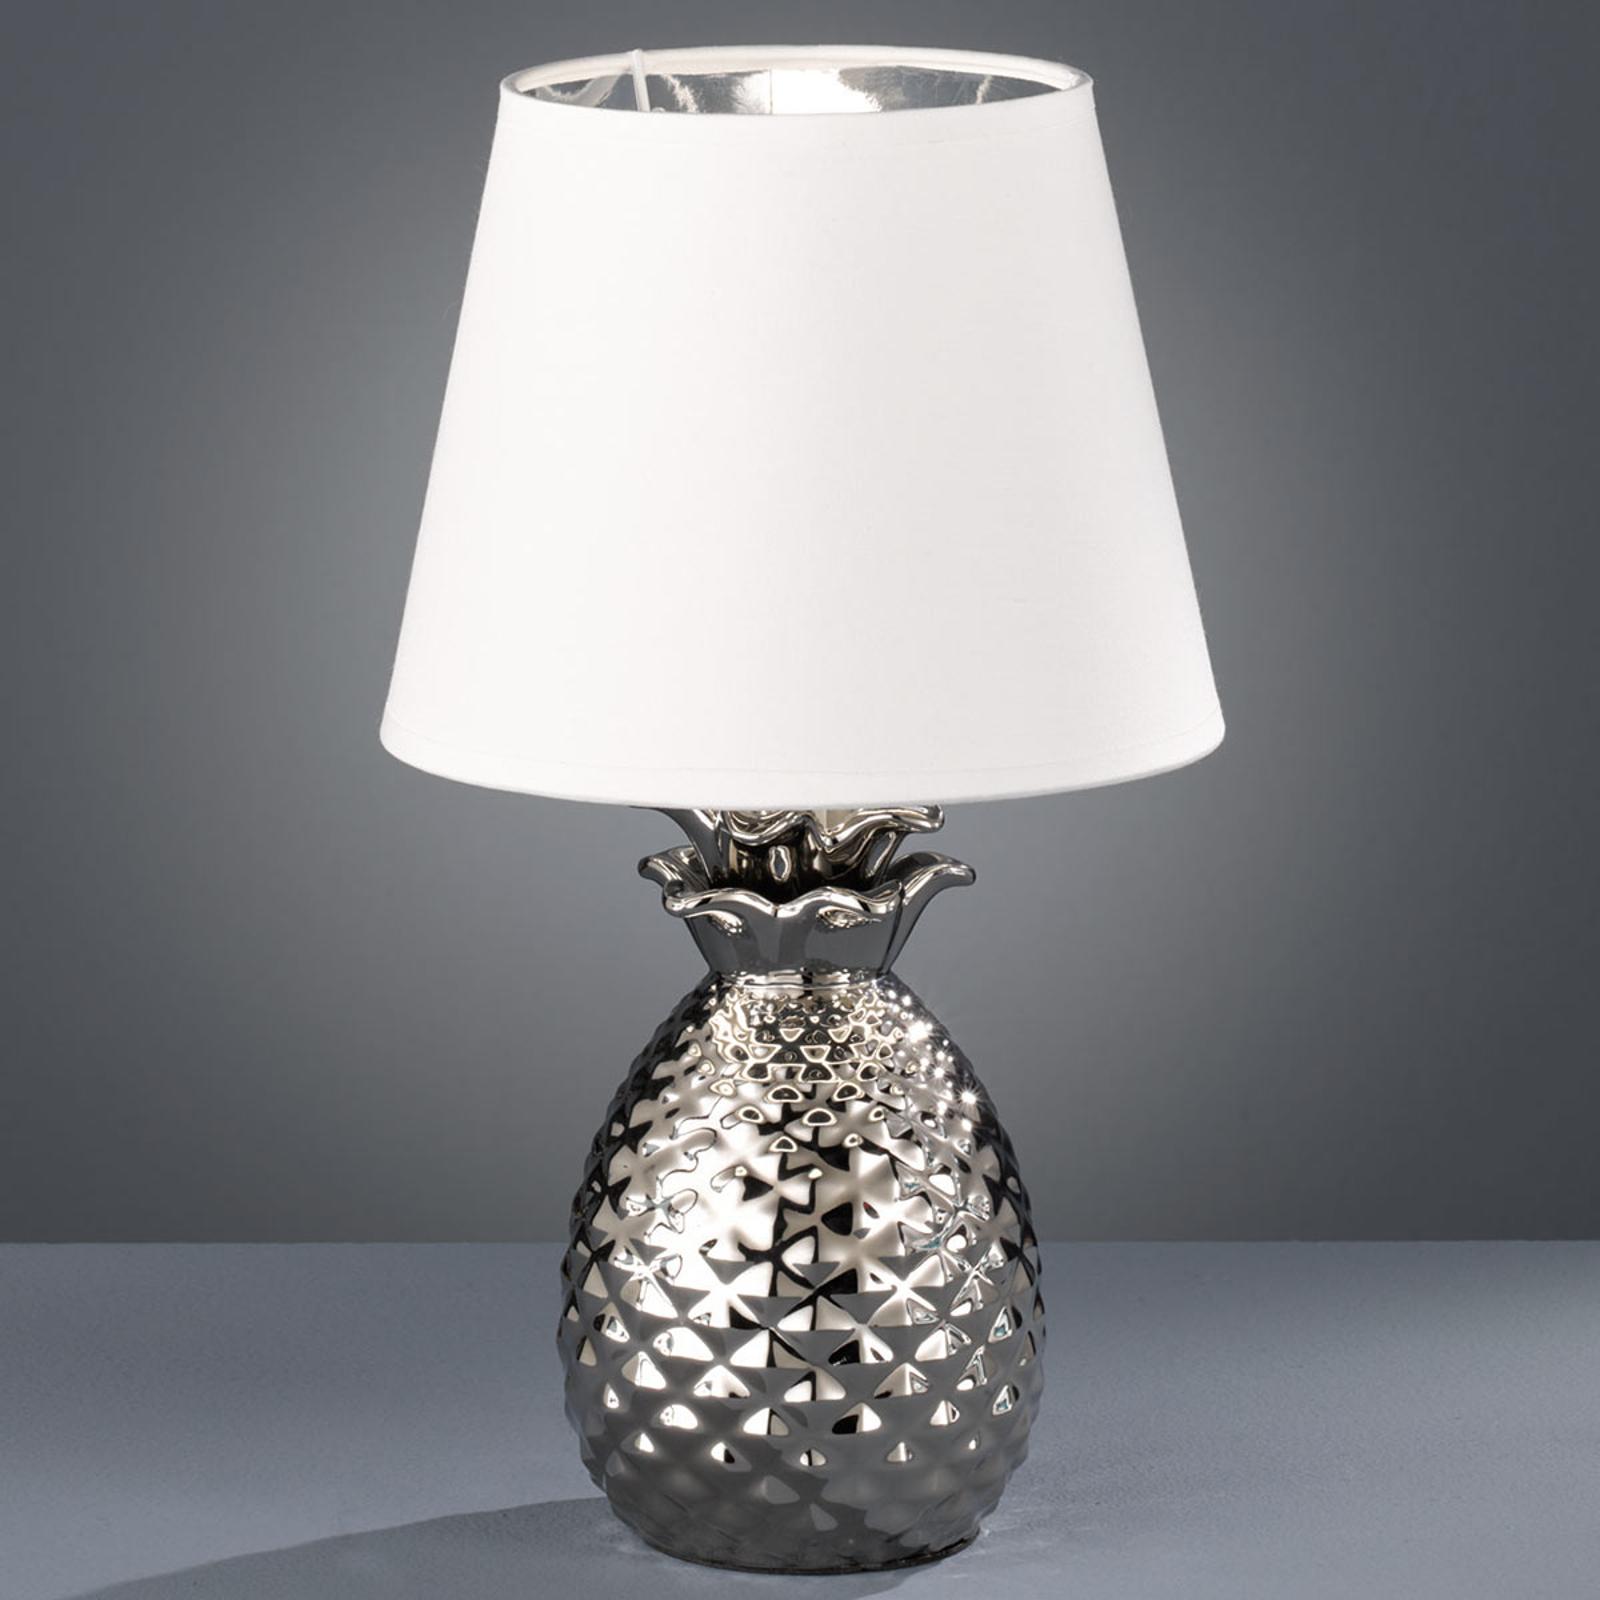 Dekorativ bordlampe Pineapple i keramikk, sølv